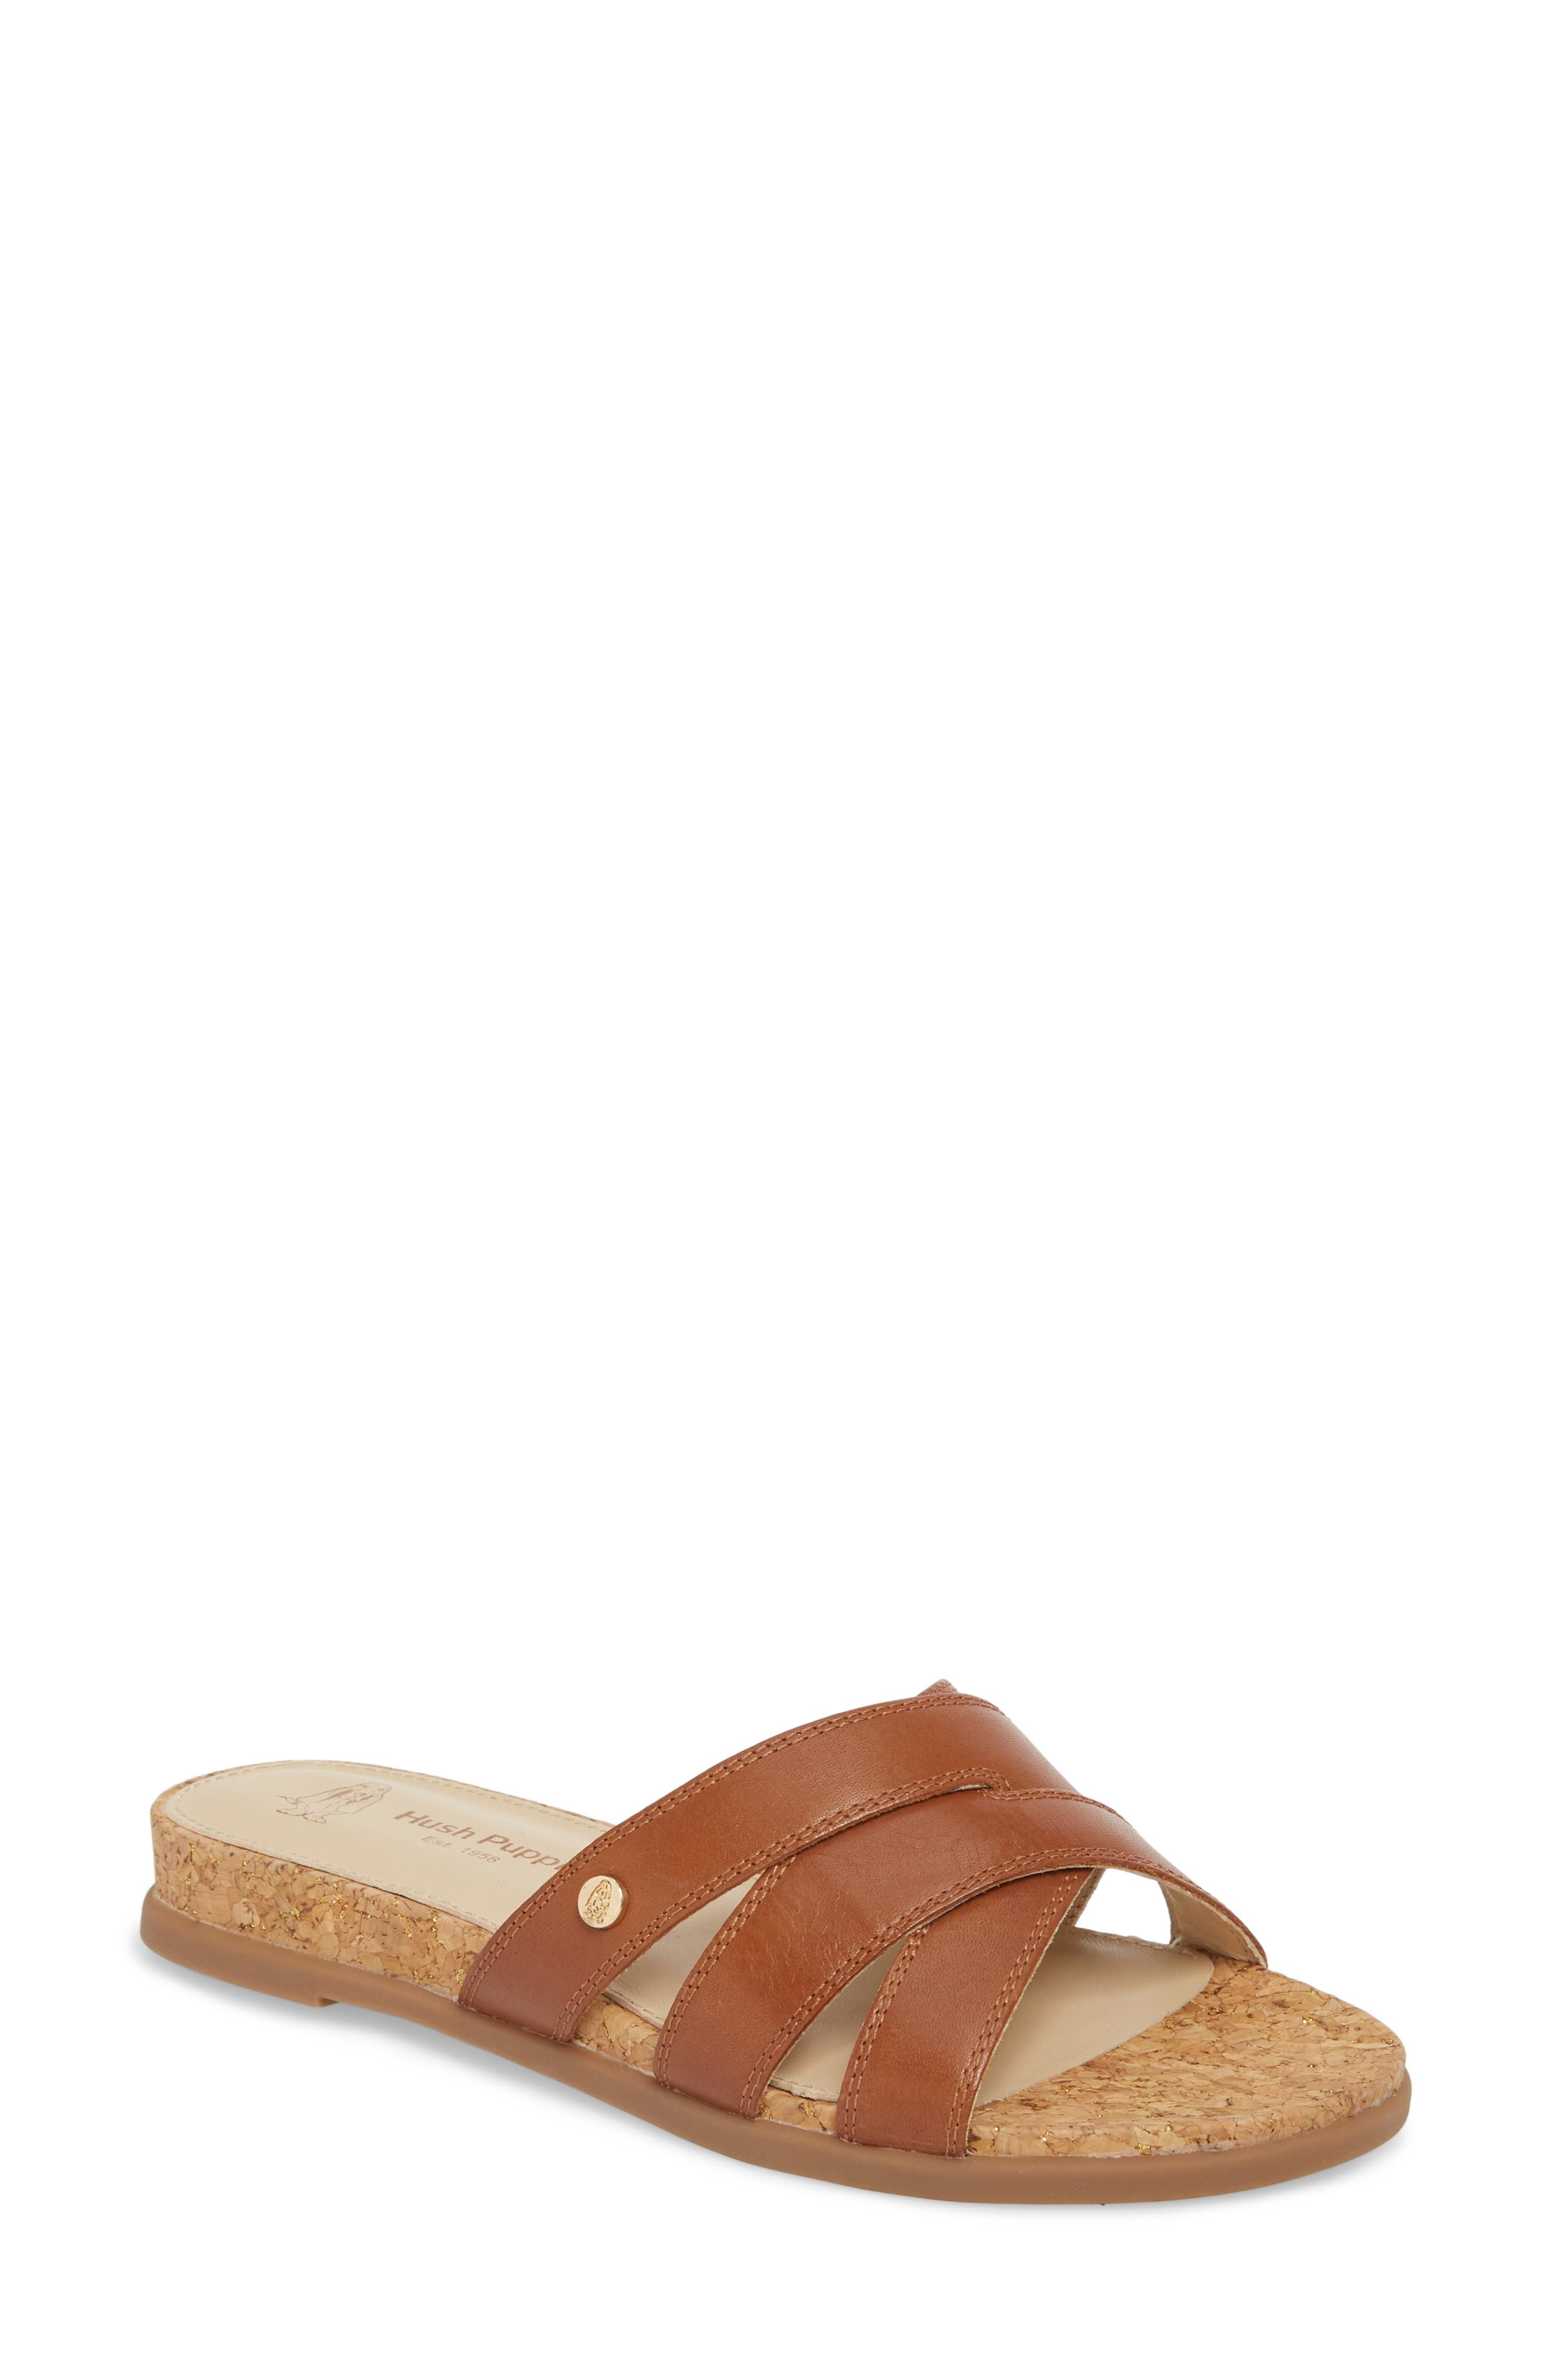 Dalmatian Slide Sandal,                             Main thumbnail 2, color,